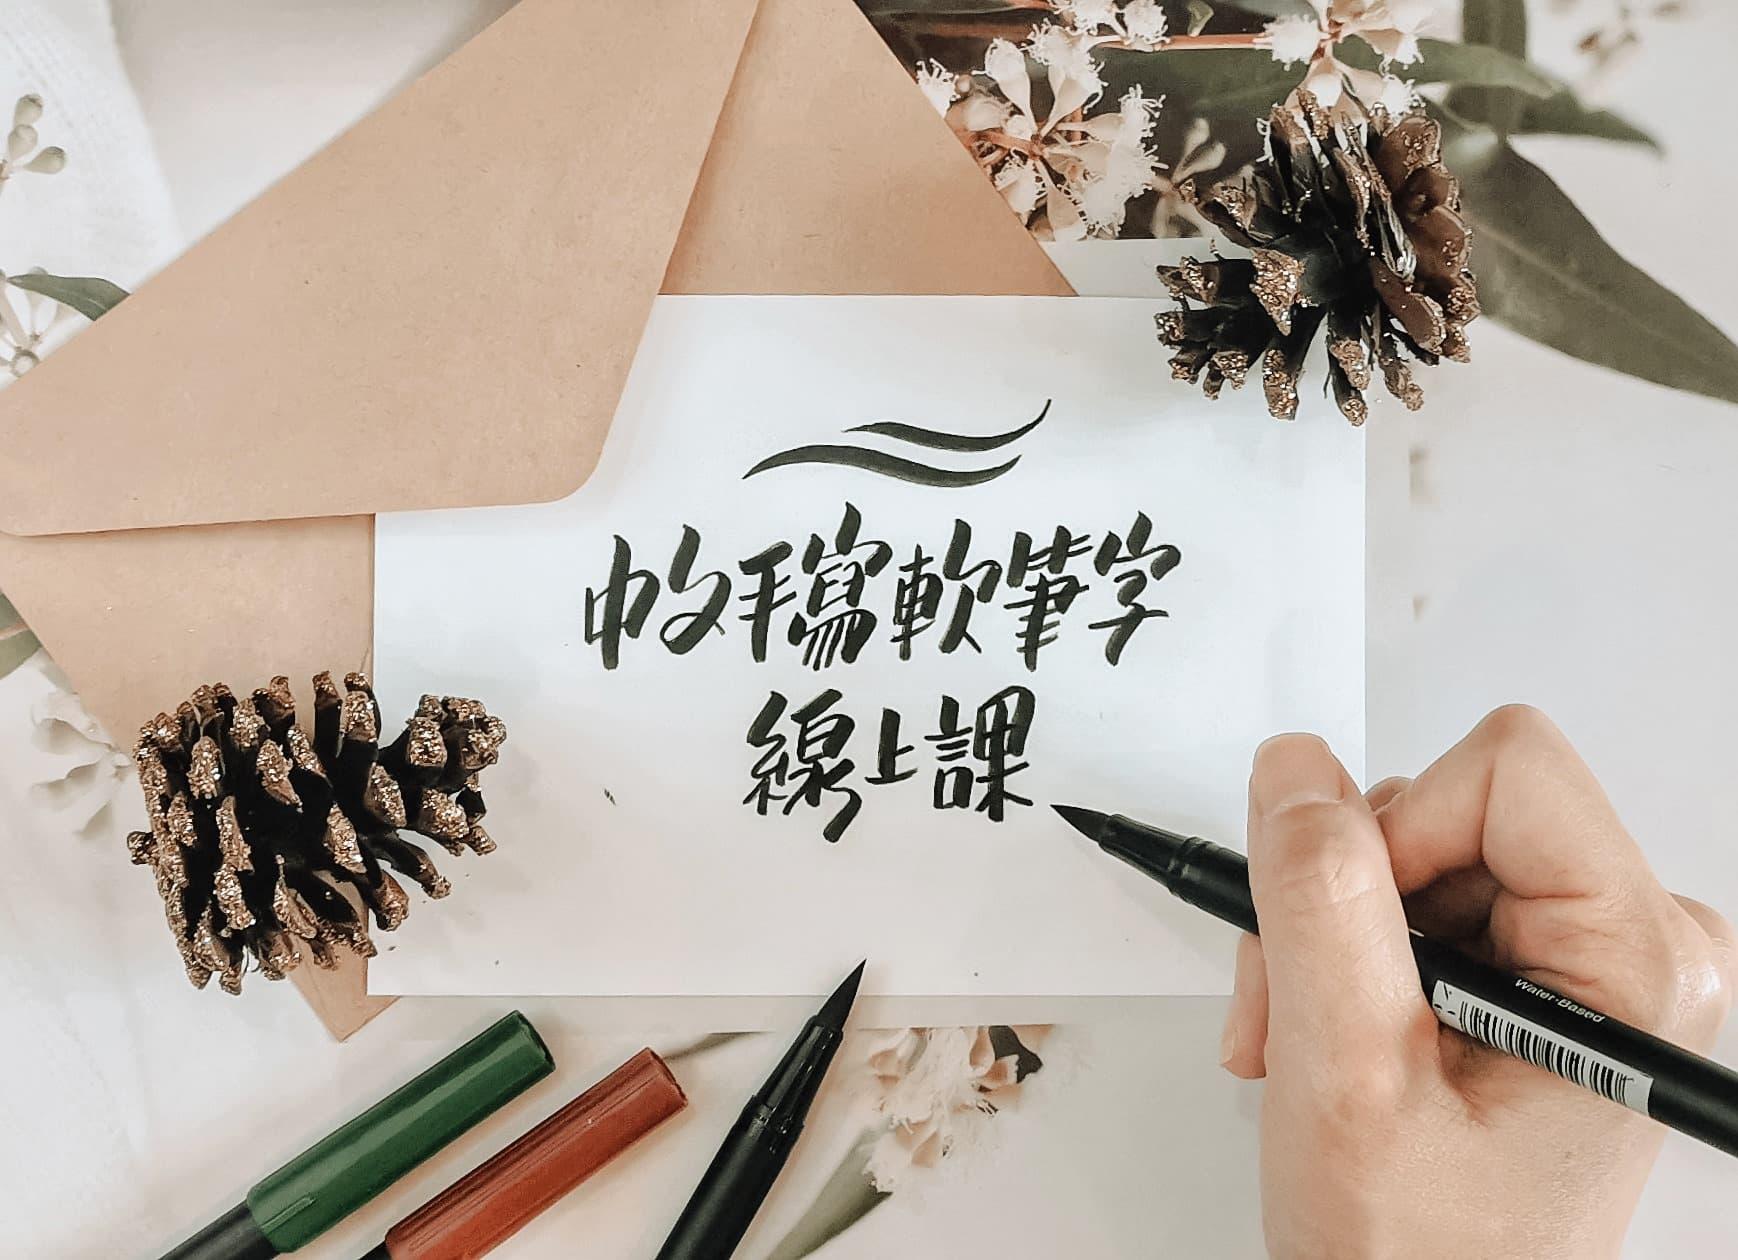 Chinese calligraphy 中文手写笔字